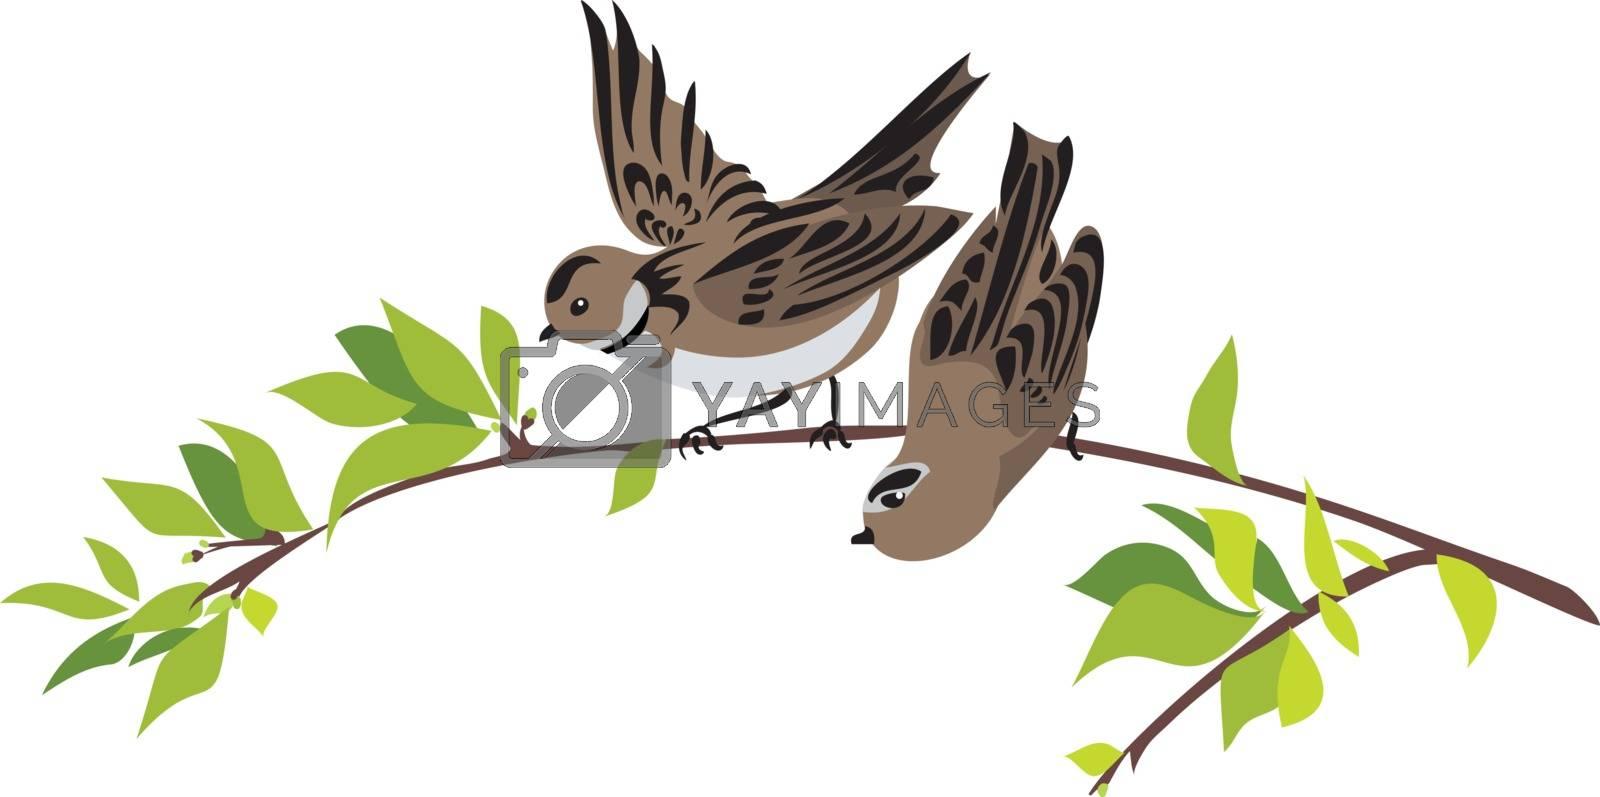 Sparrows on a spring tree branch, vector illustration